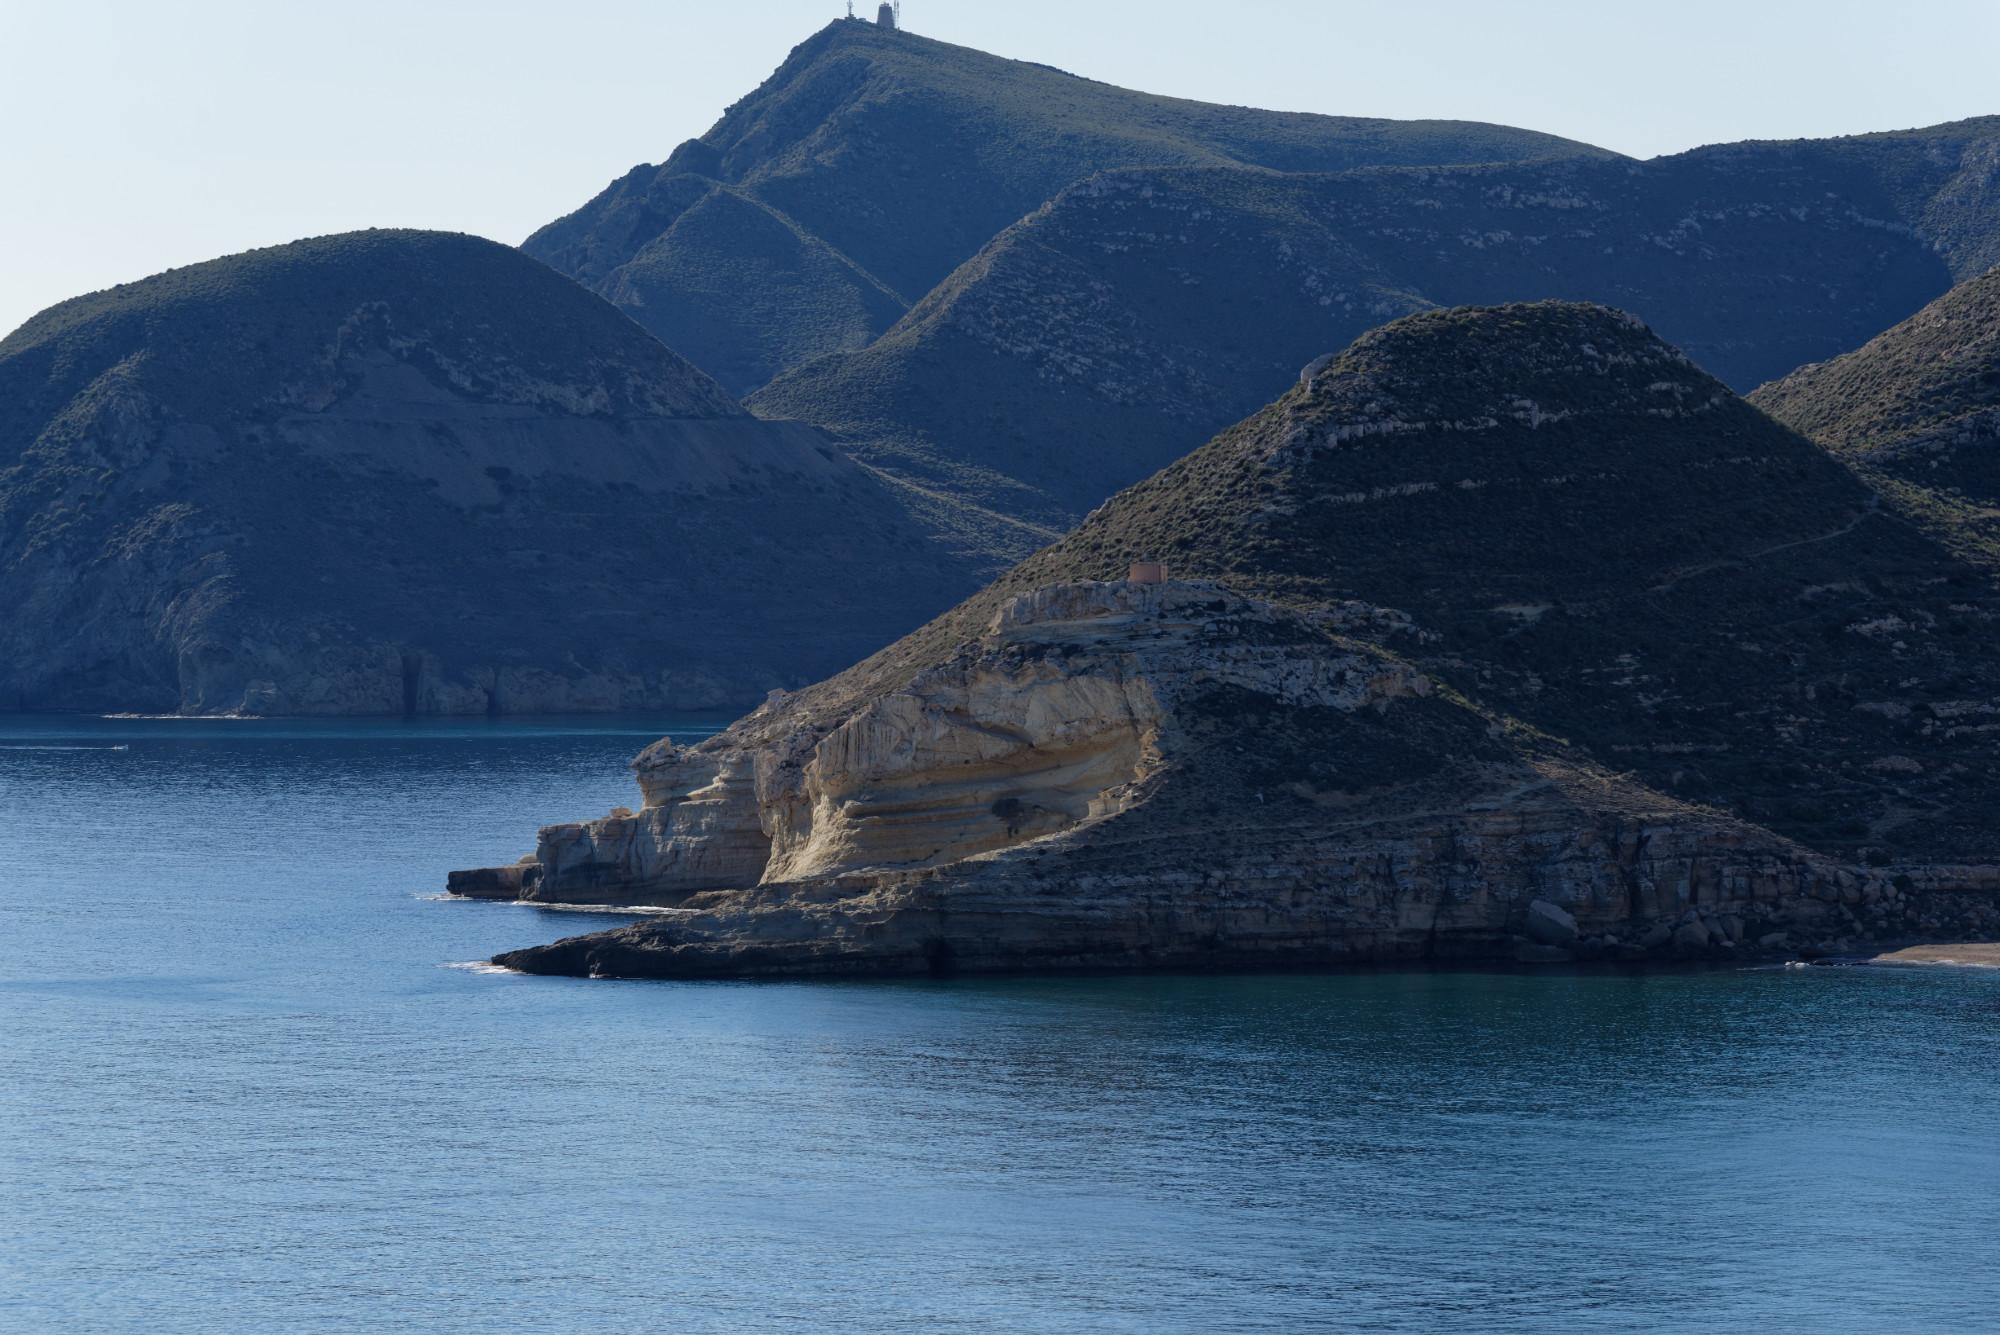 171213-Marche Las Negras-Cala San Pedro-Las Negras (18) (Cabo de Gata-Andalousie)